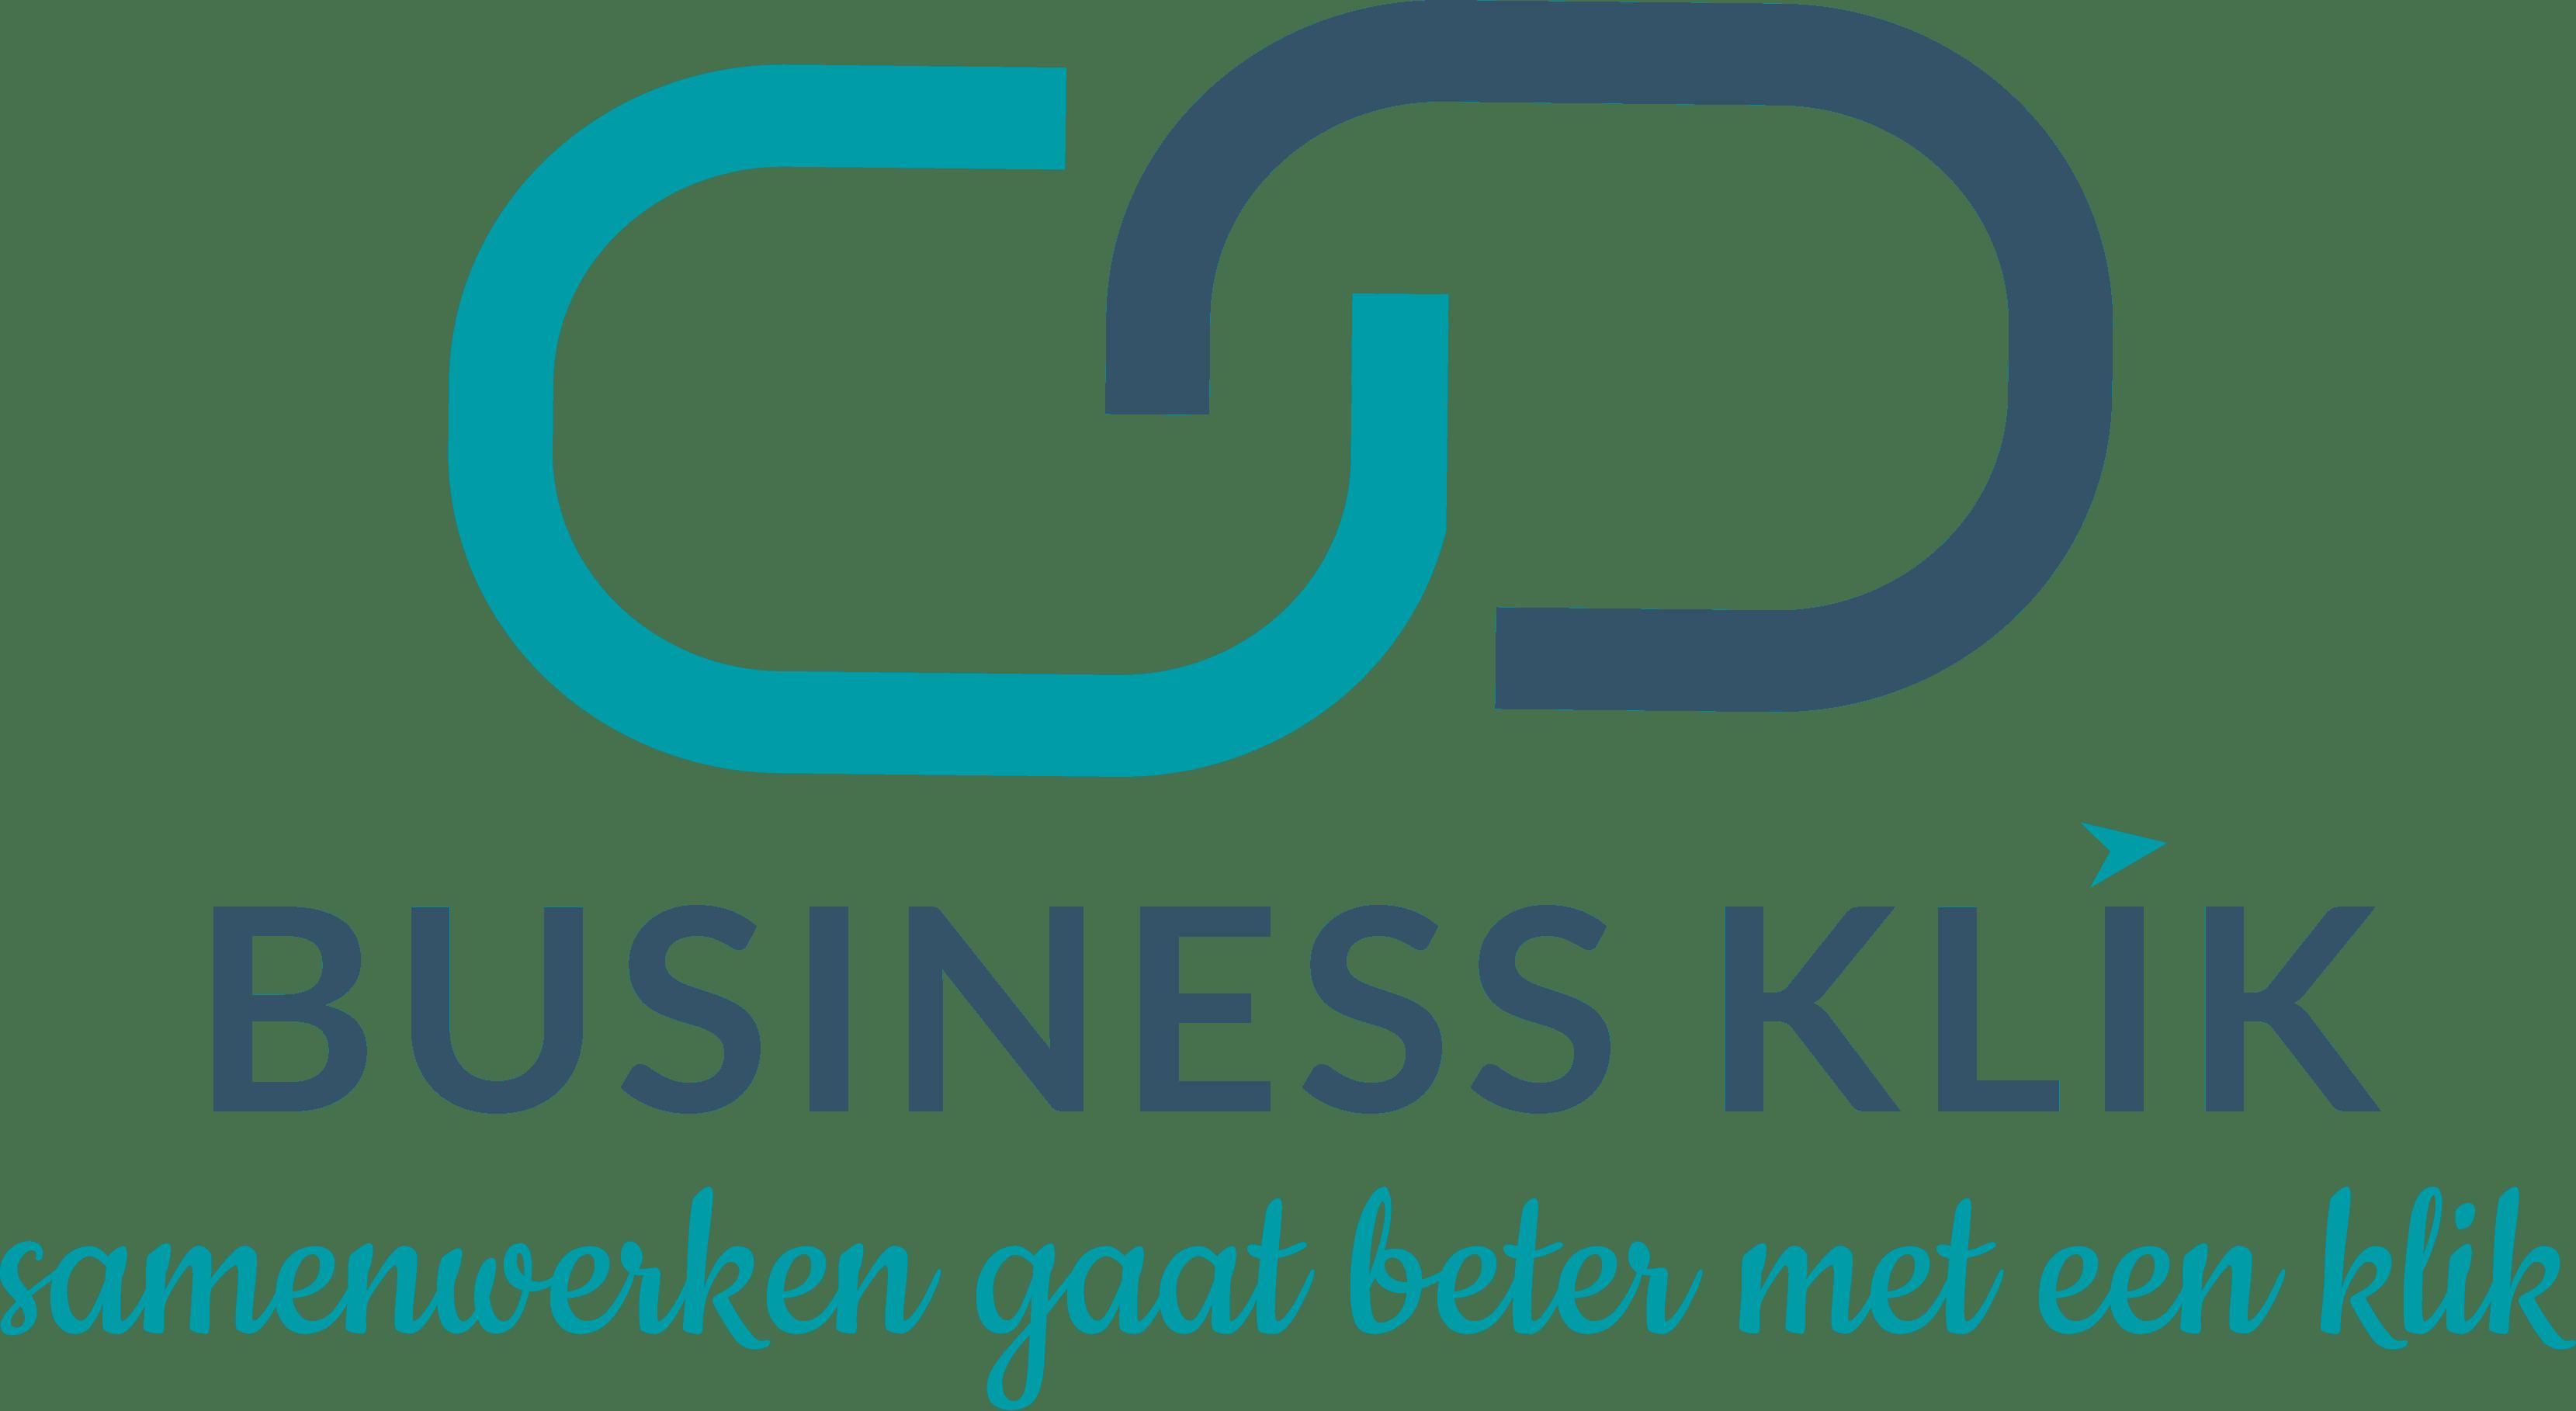 https://www.virtualstars.nl/wp-content/uploads/2020/07/logo-kleur.png